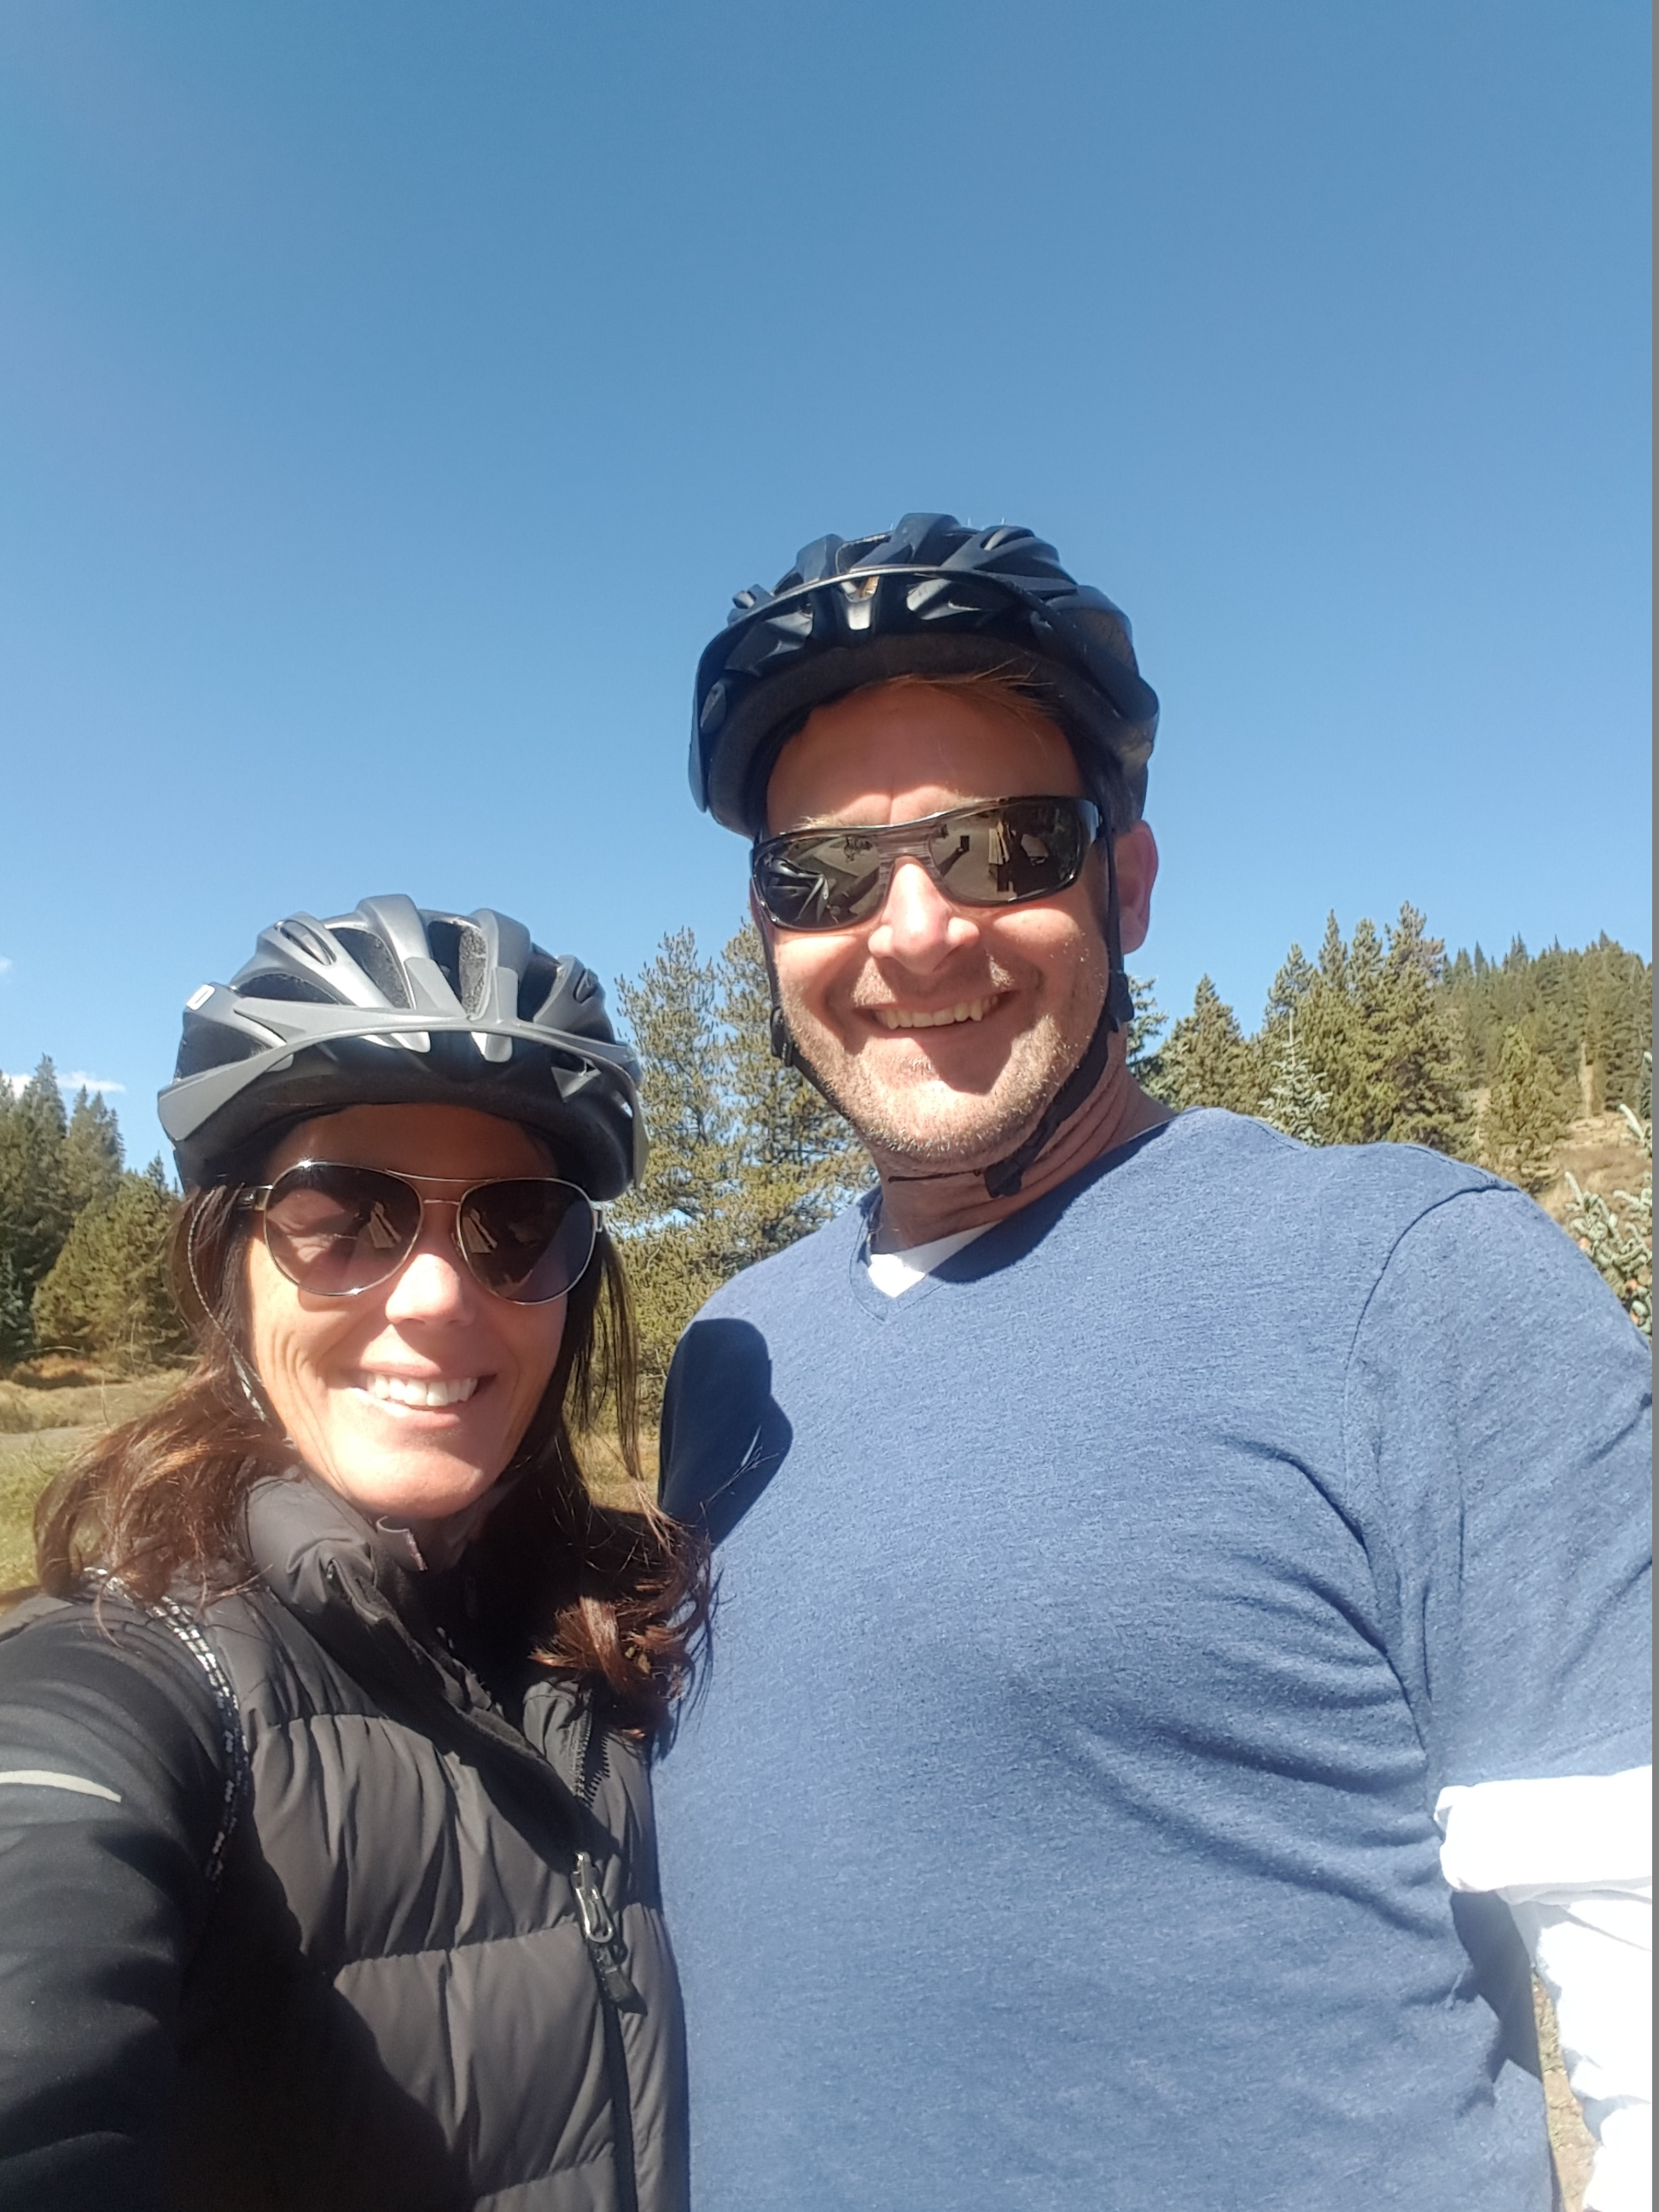 Biking in Colorado